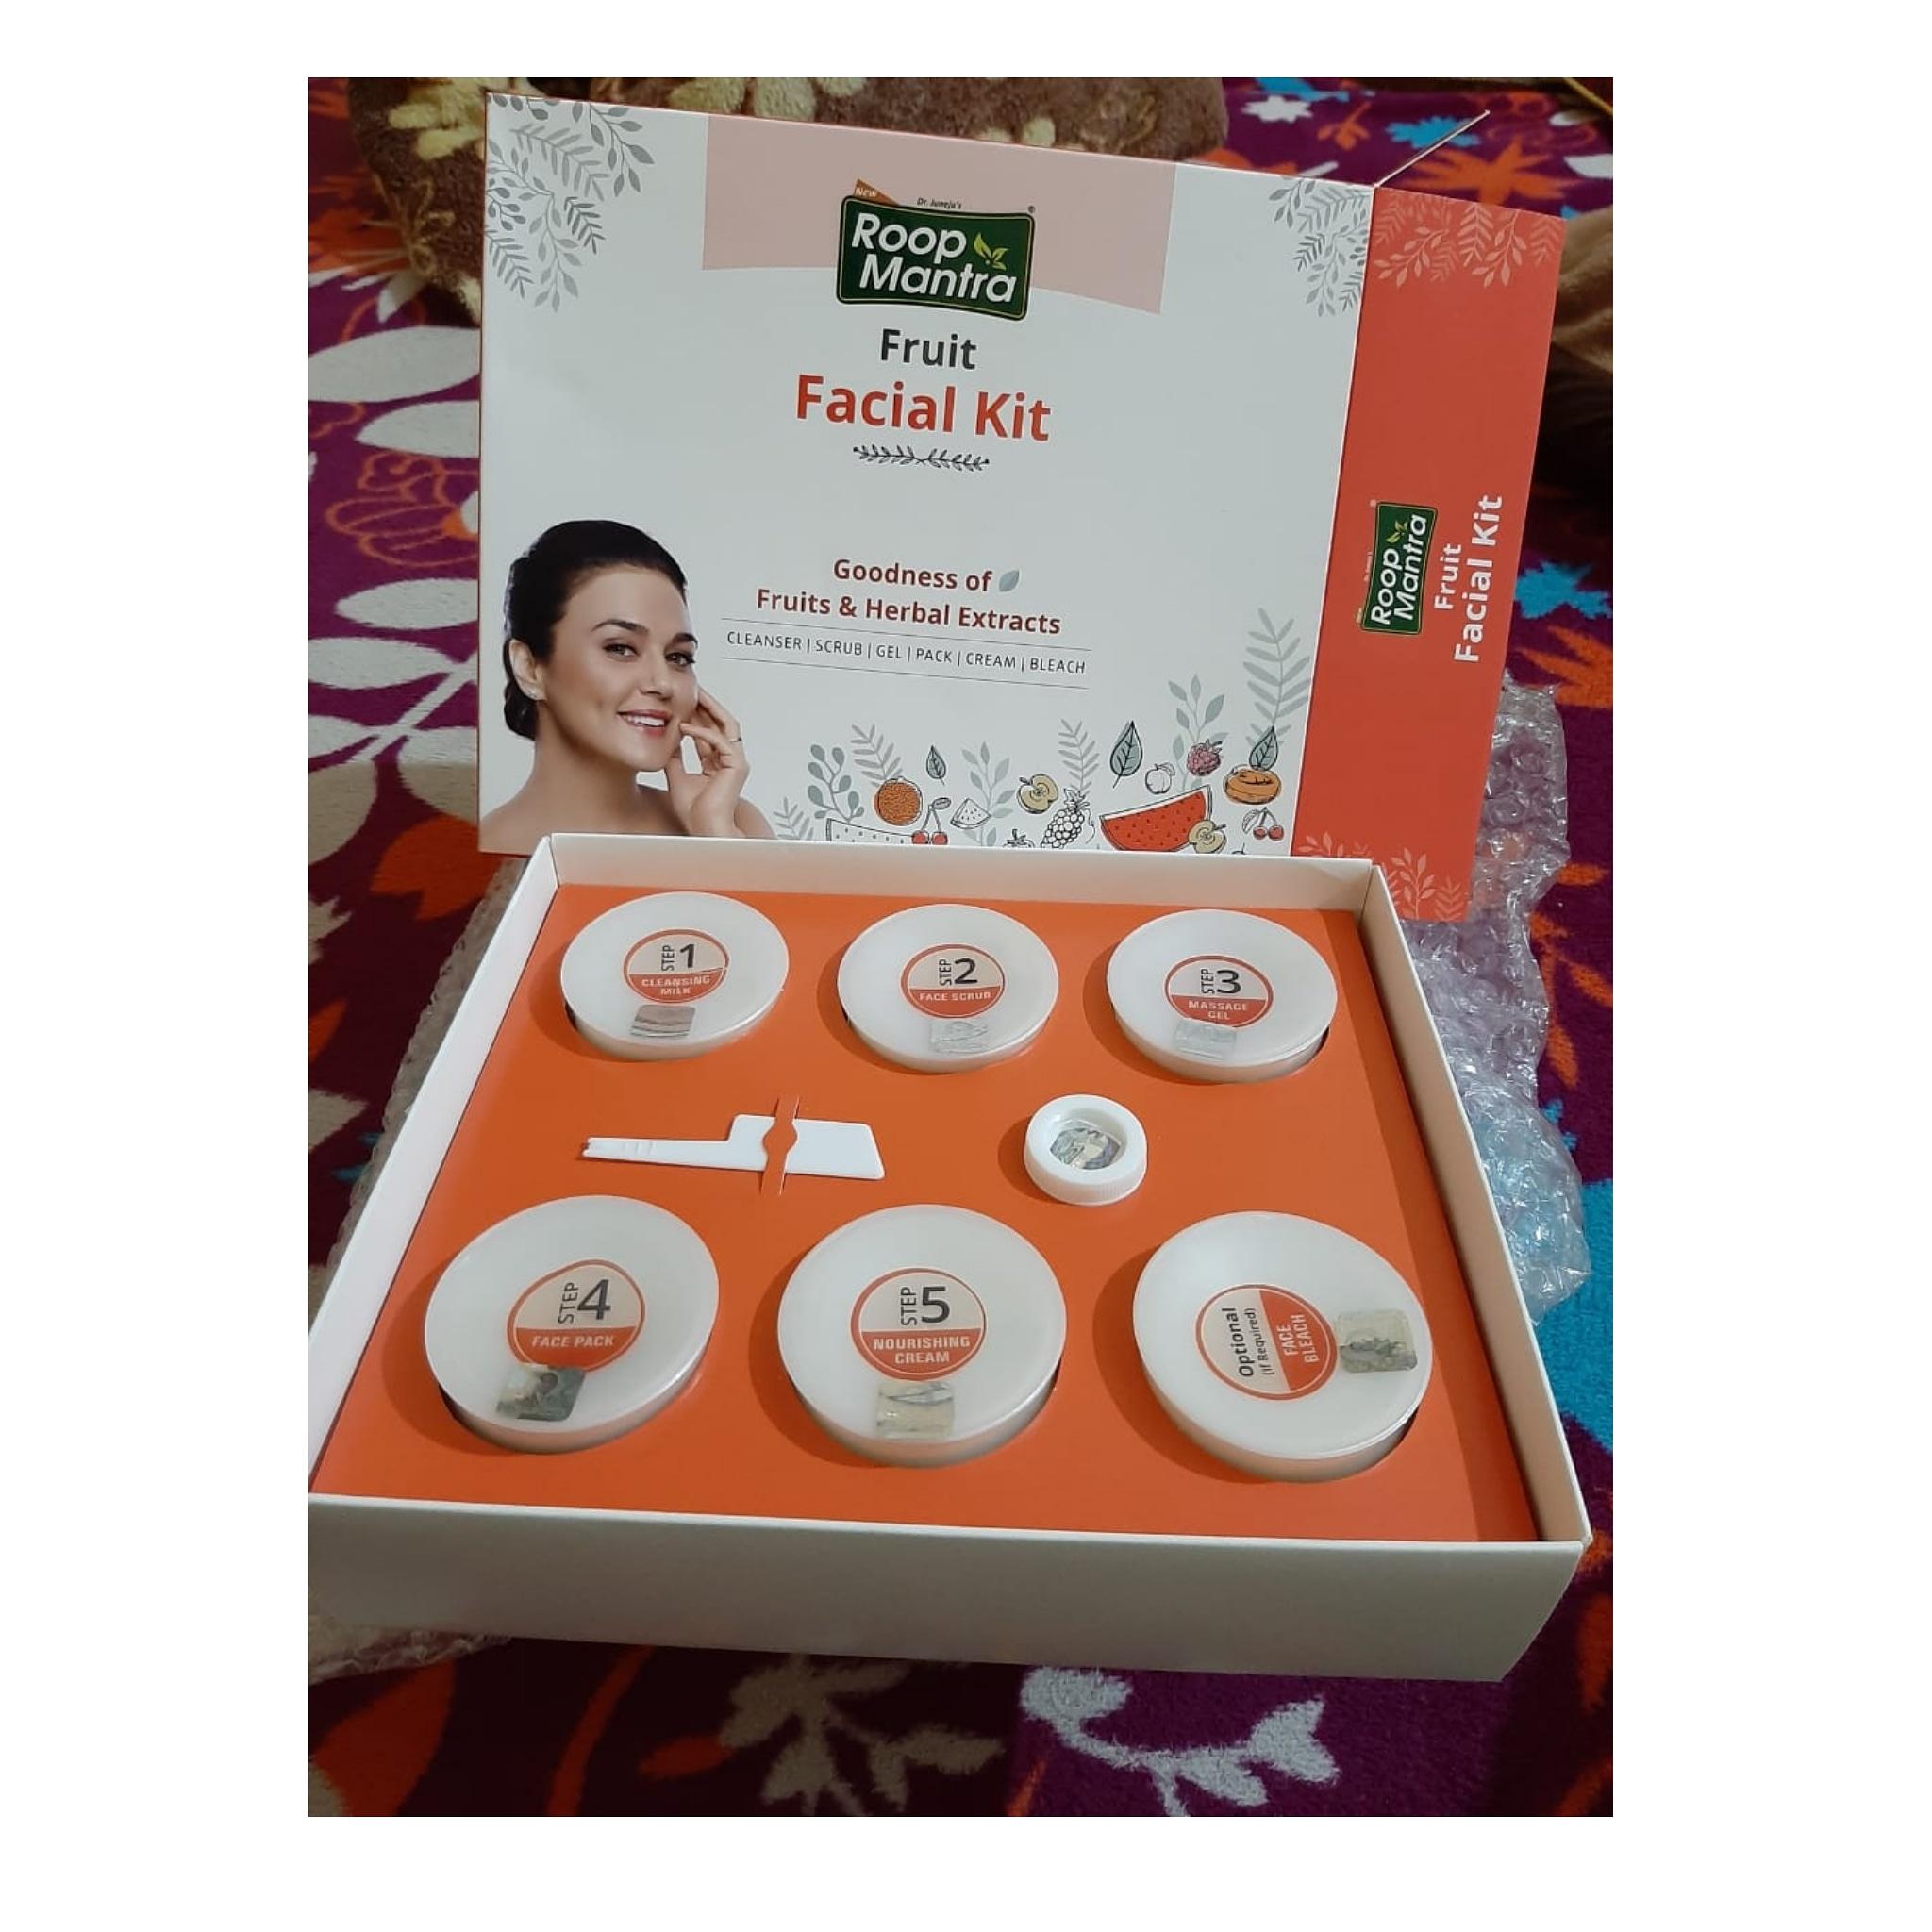 Roop Mantra Fruit Facial Kit-Gives instant glow-By aprajita_thakur